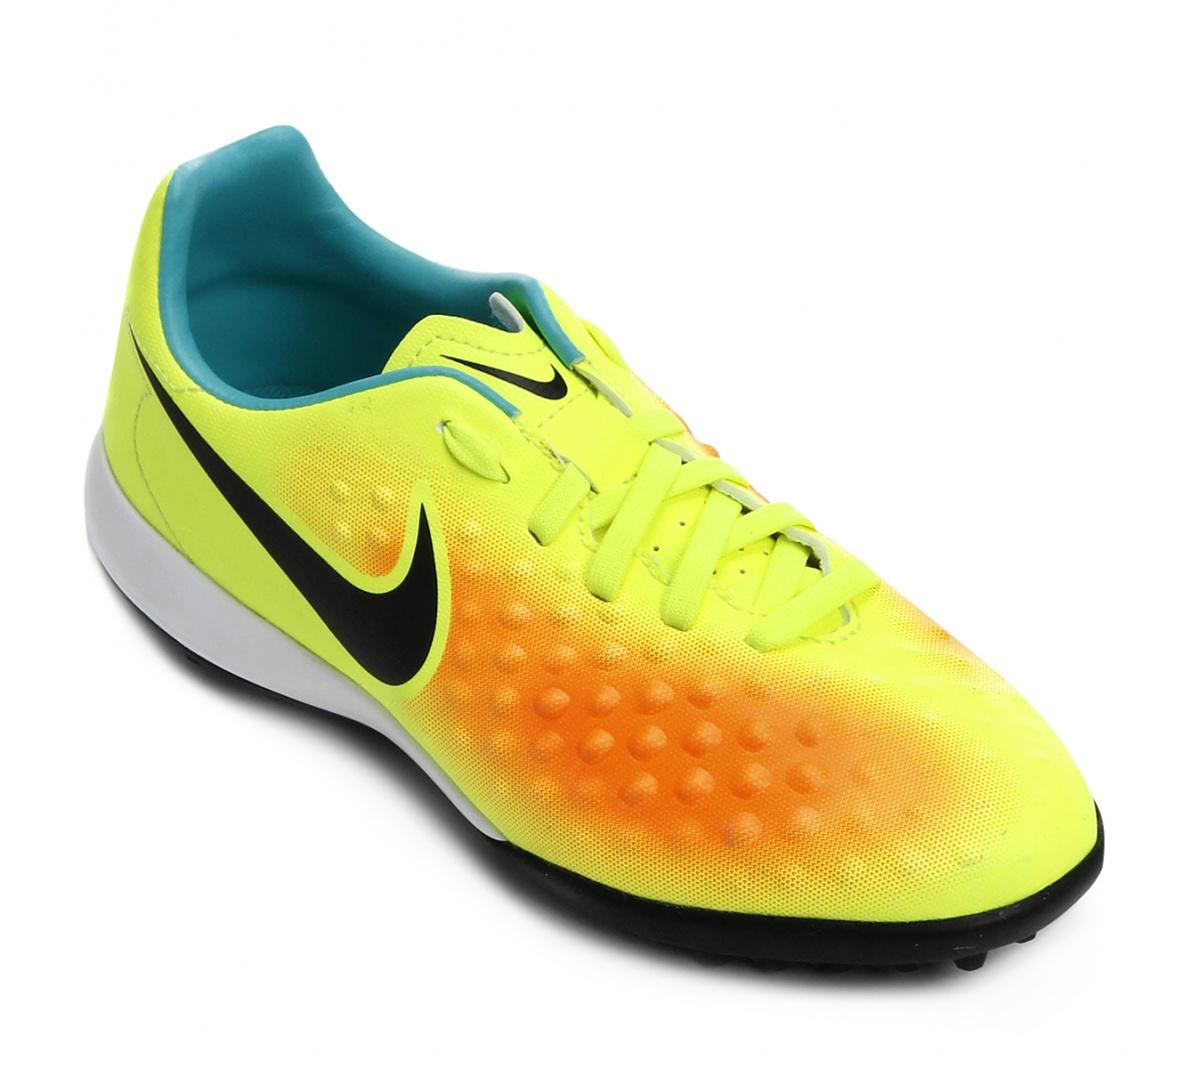 469d6360a2 Chuteira Nike Magista Opus Society Infantil Am - Mundo do Futebol